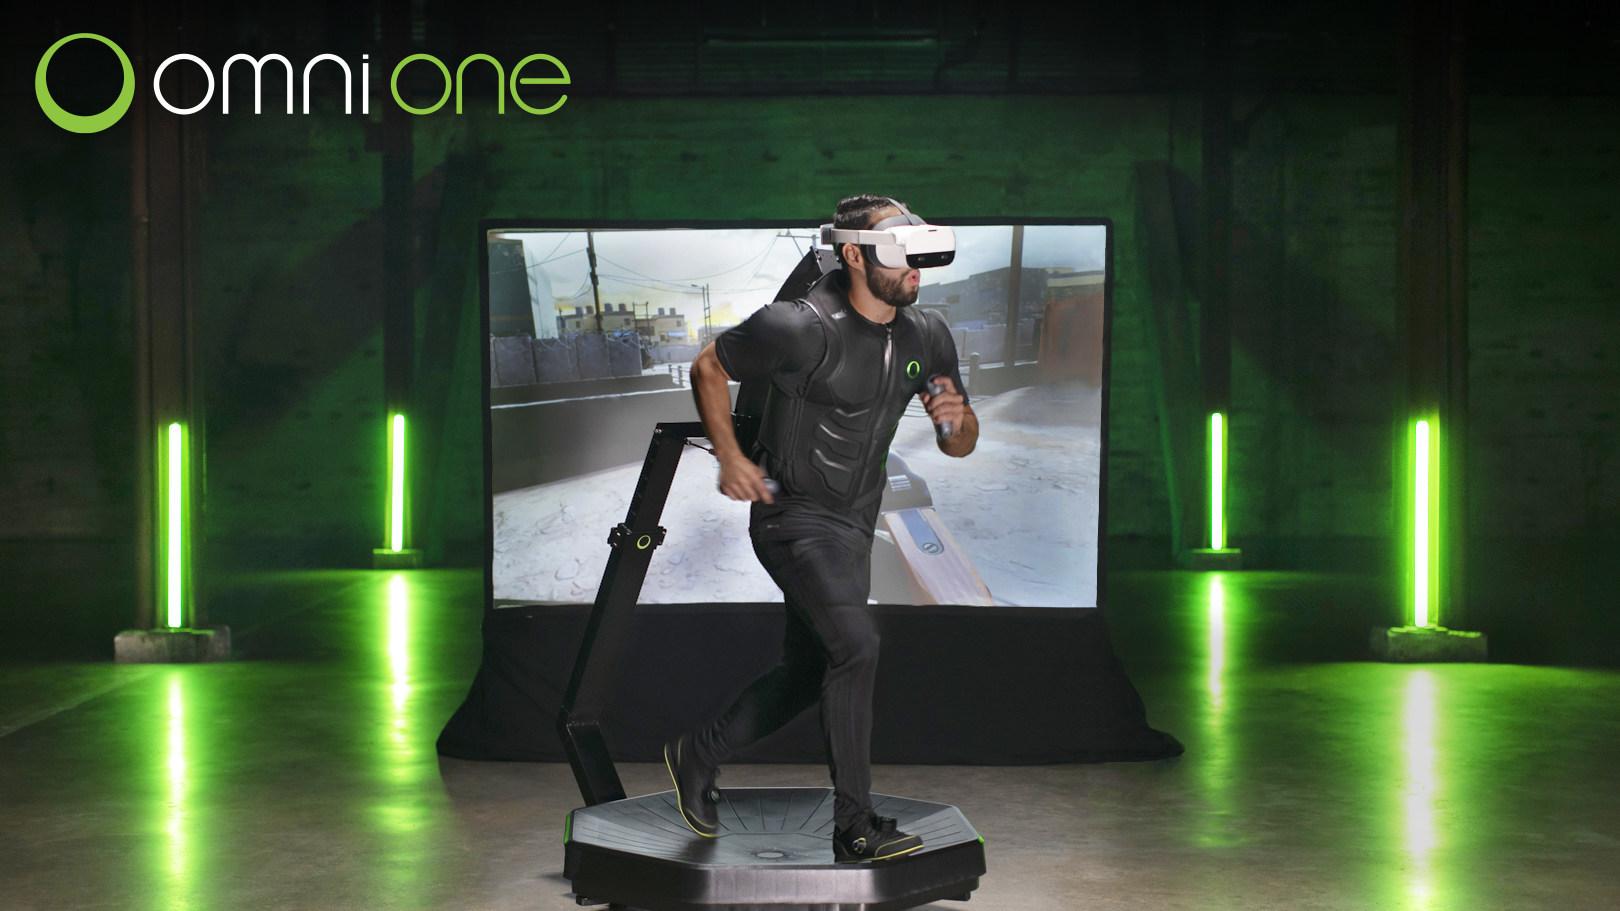 Billionaire investor Mark Cuban backs Omni One treadmill